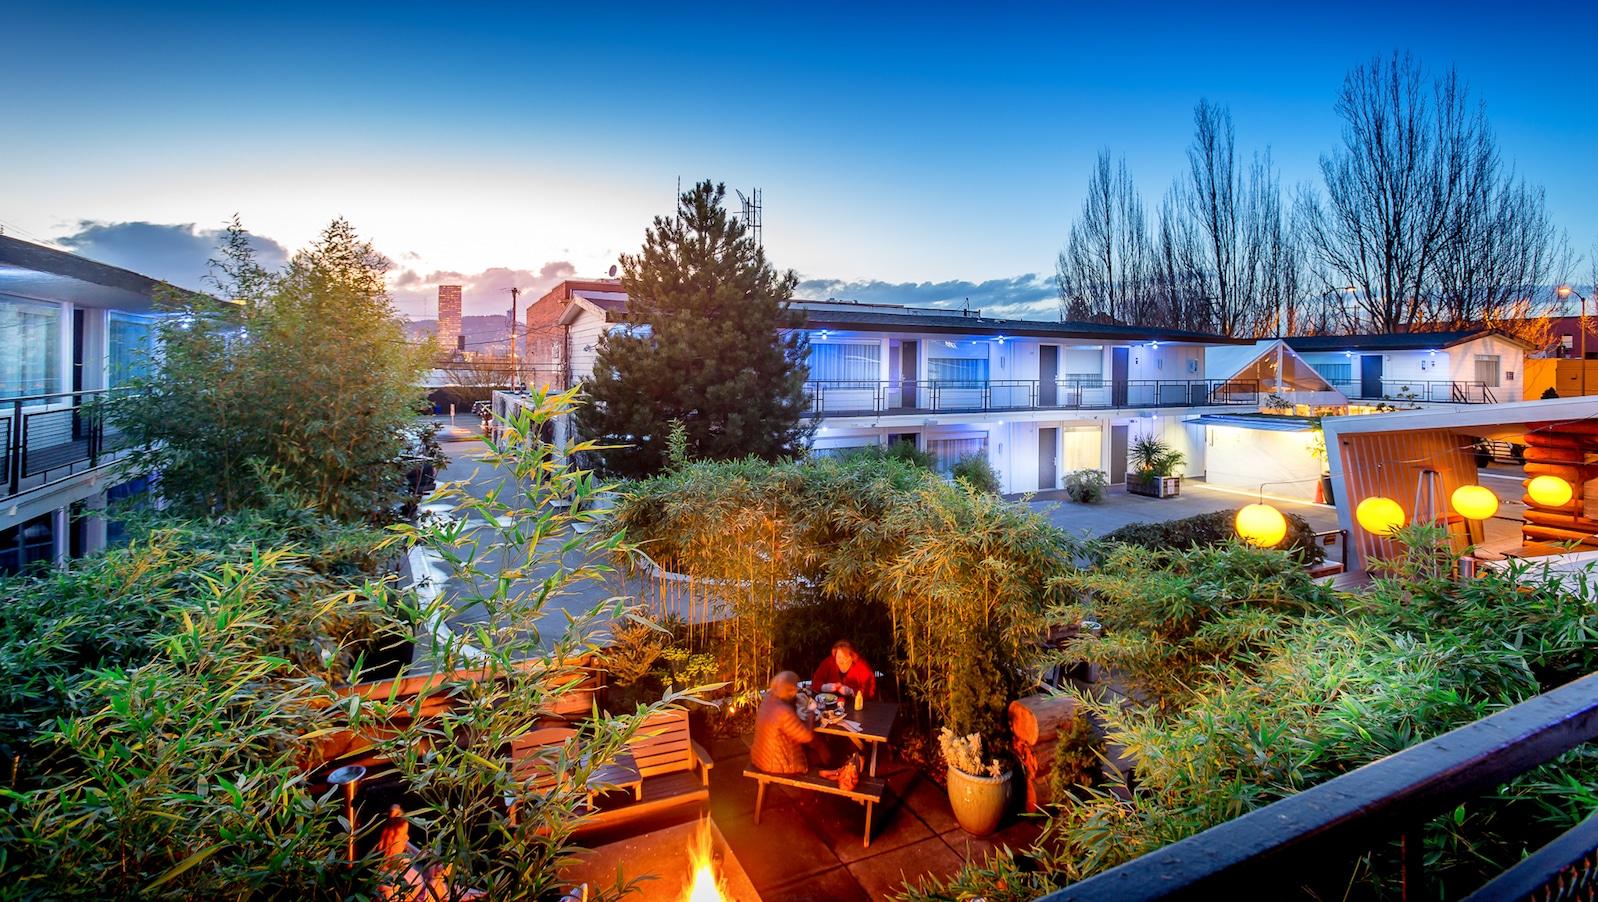 The Jupiter Hotel Doug Fir Patio & Lounge Portland